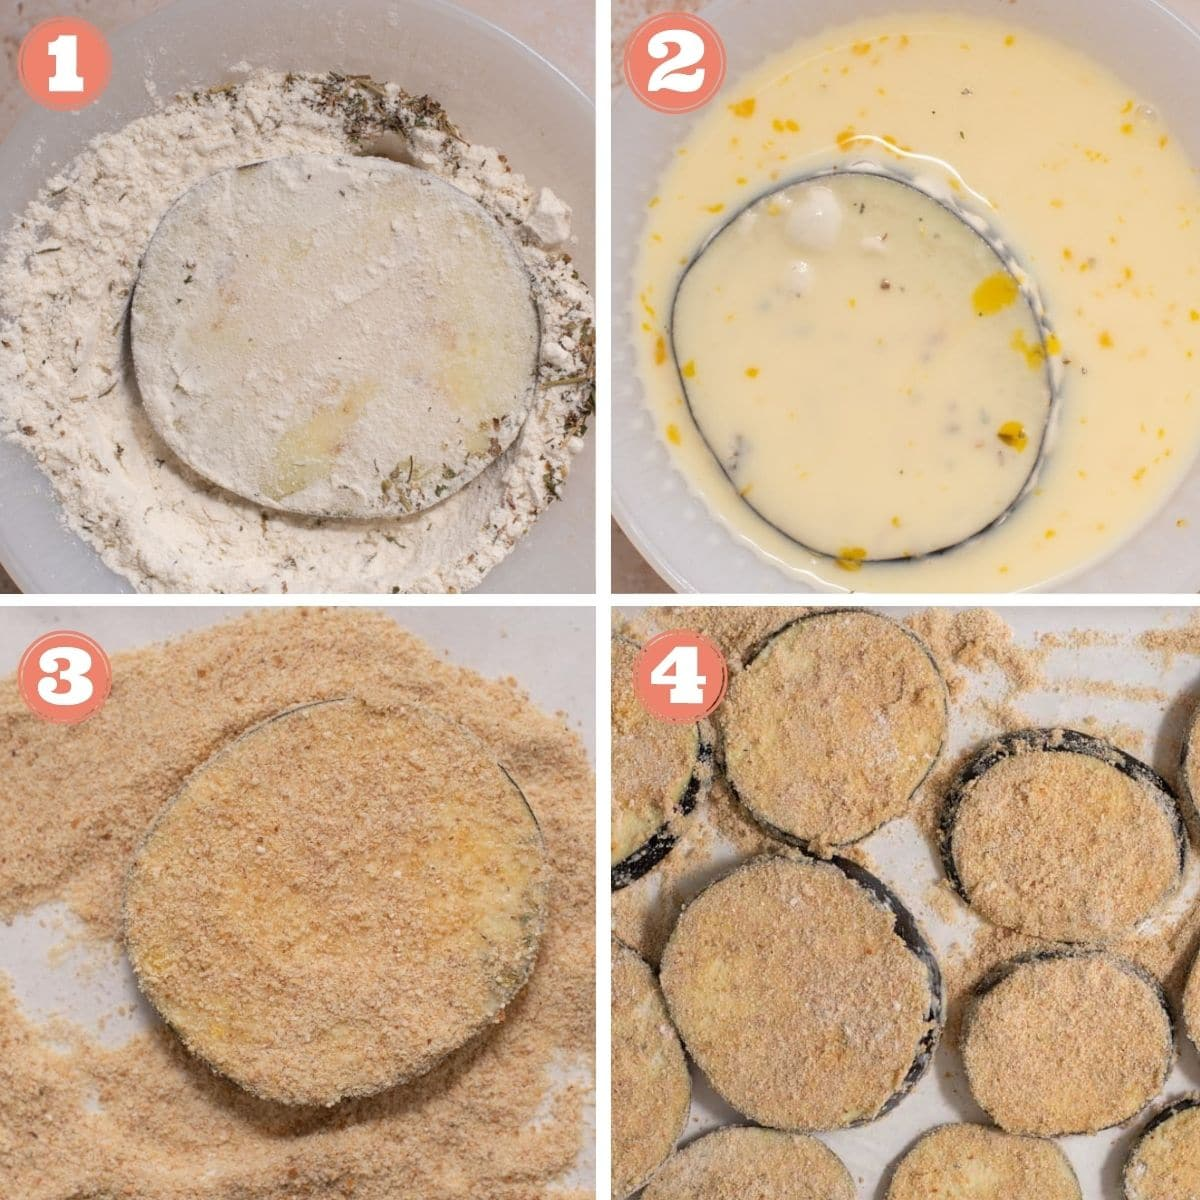 Steps 1 through 4 to bread eggplant